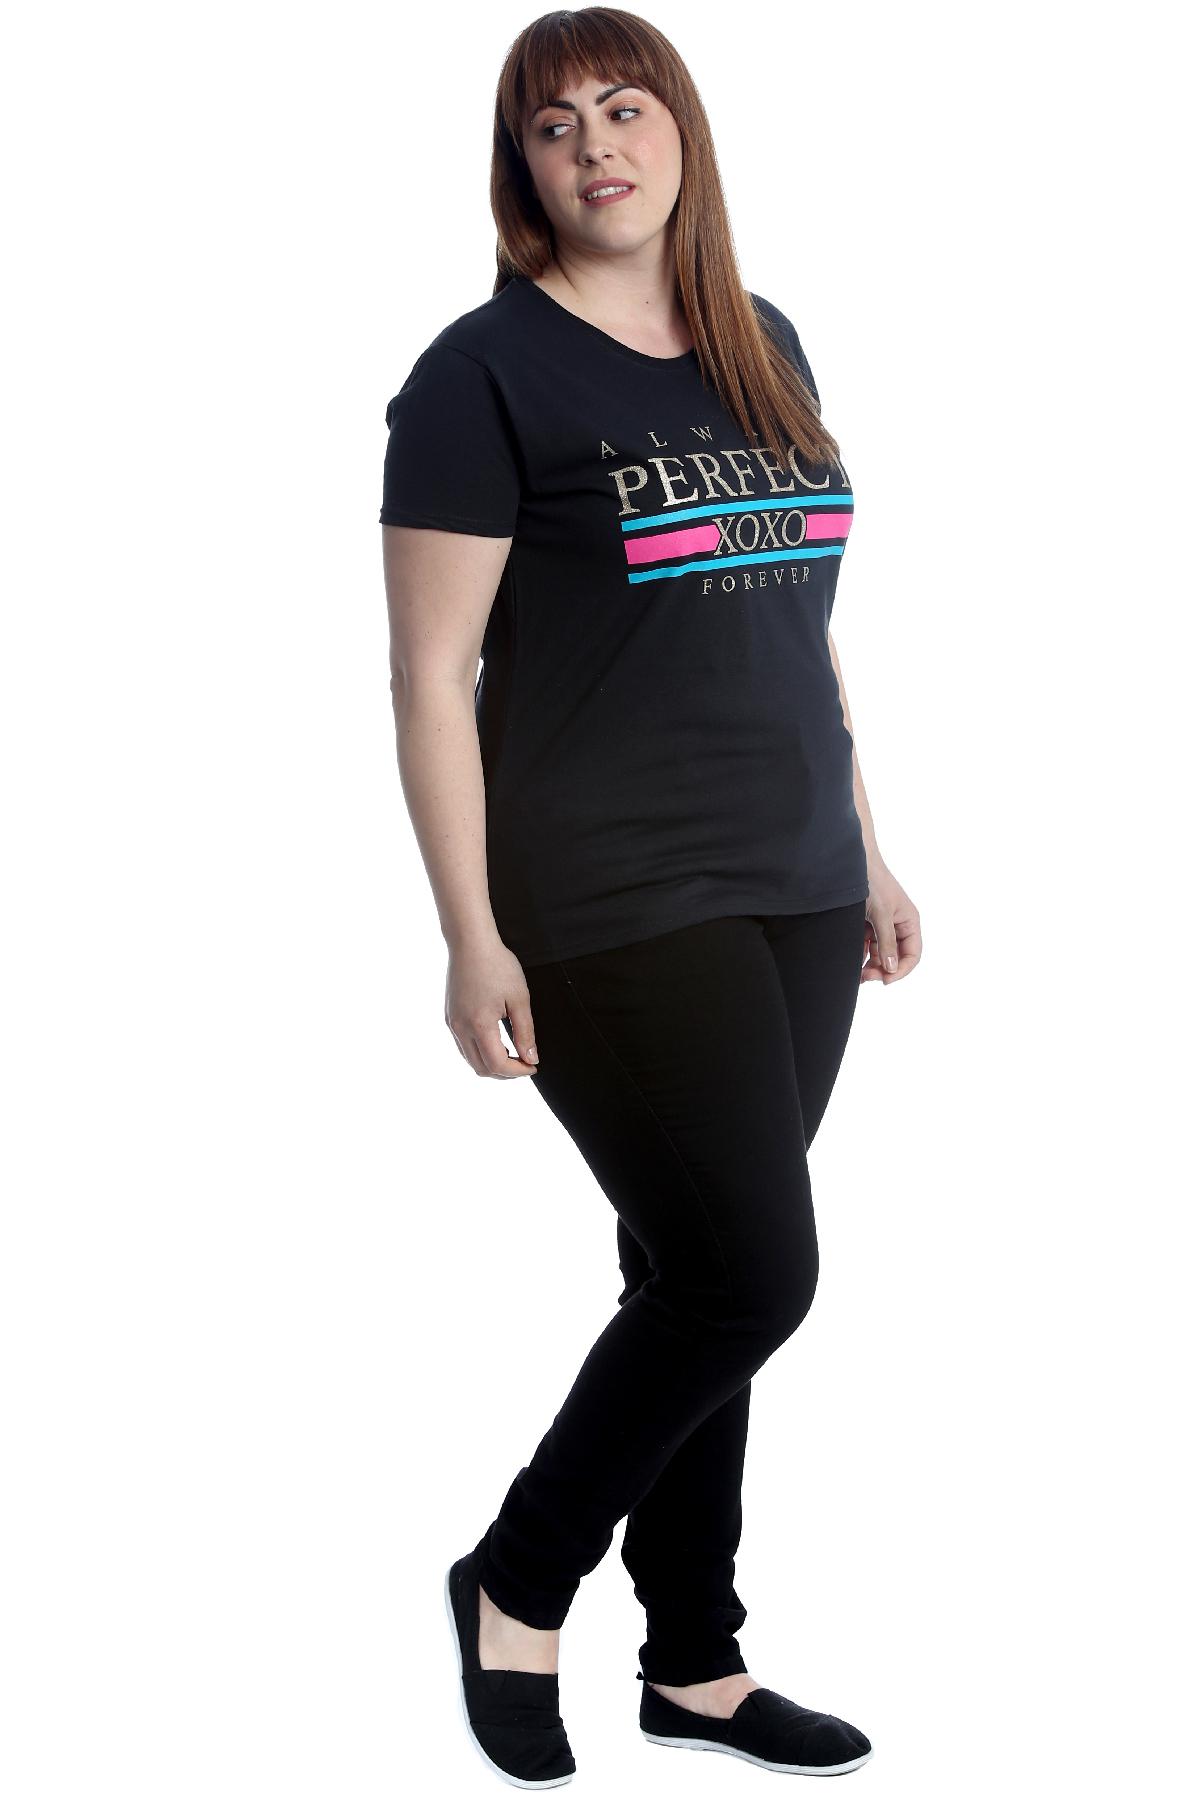 New Womens Plus Size T-Shirt Ladies Cotton Top Always Perfect XOXO Print Sale